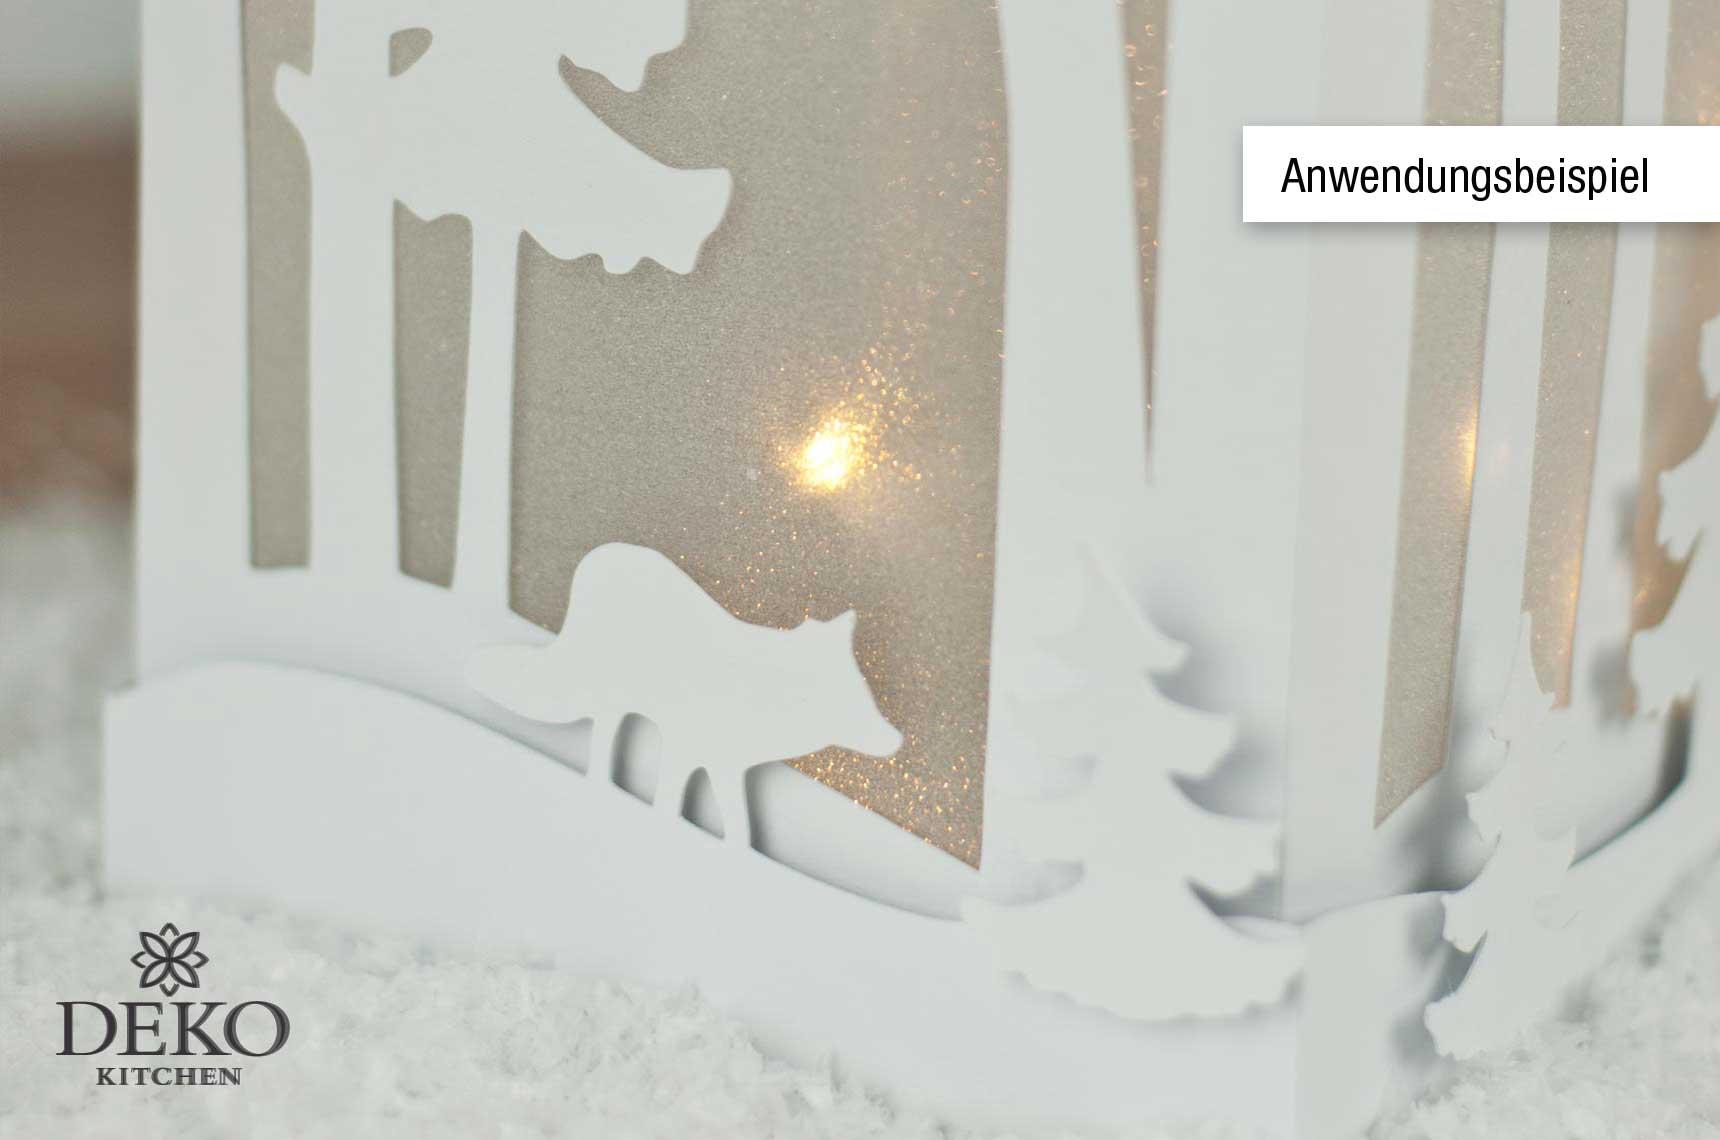 glimmereffekt folie deko kitchen shop. Black Bedroom Furniture Sets. Home Design Ideas